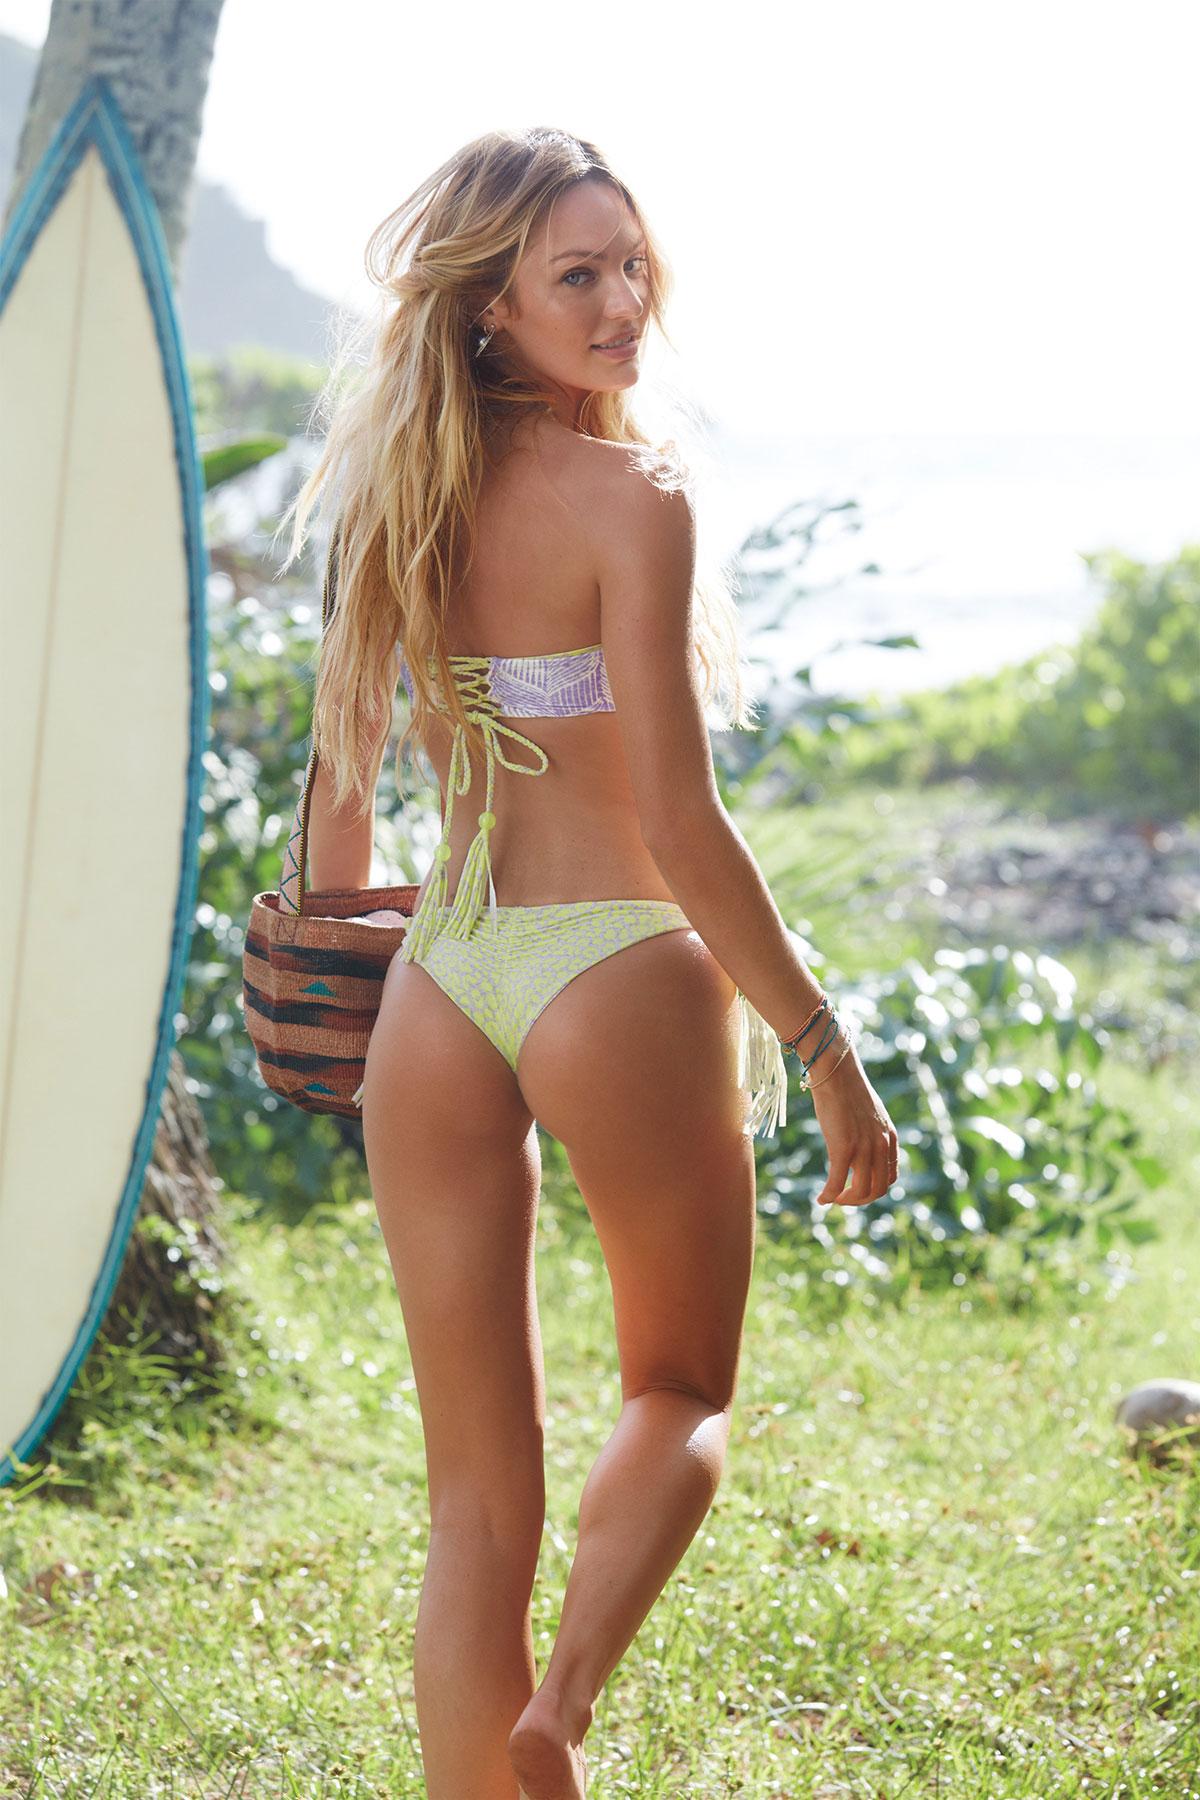 Michelle Lewin - Wearing Bikini on Miami Beach | GotCeleb